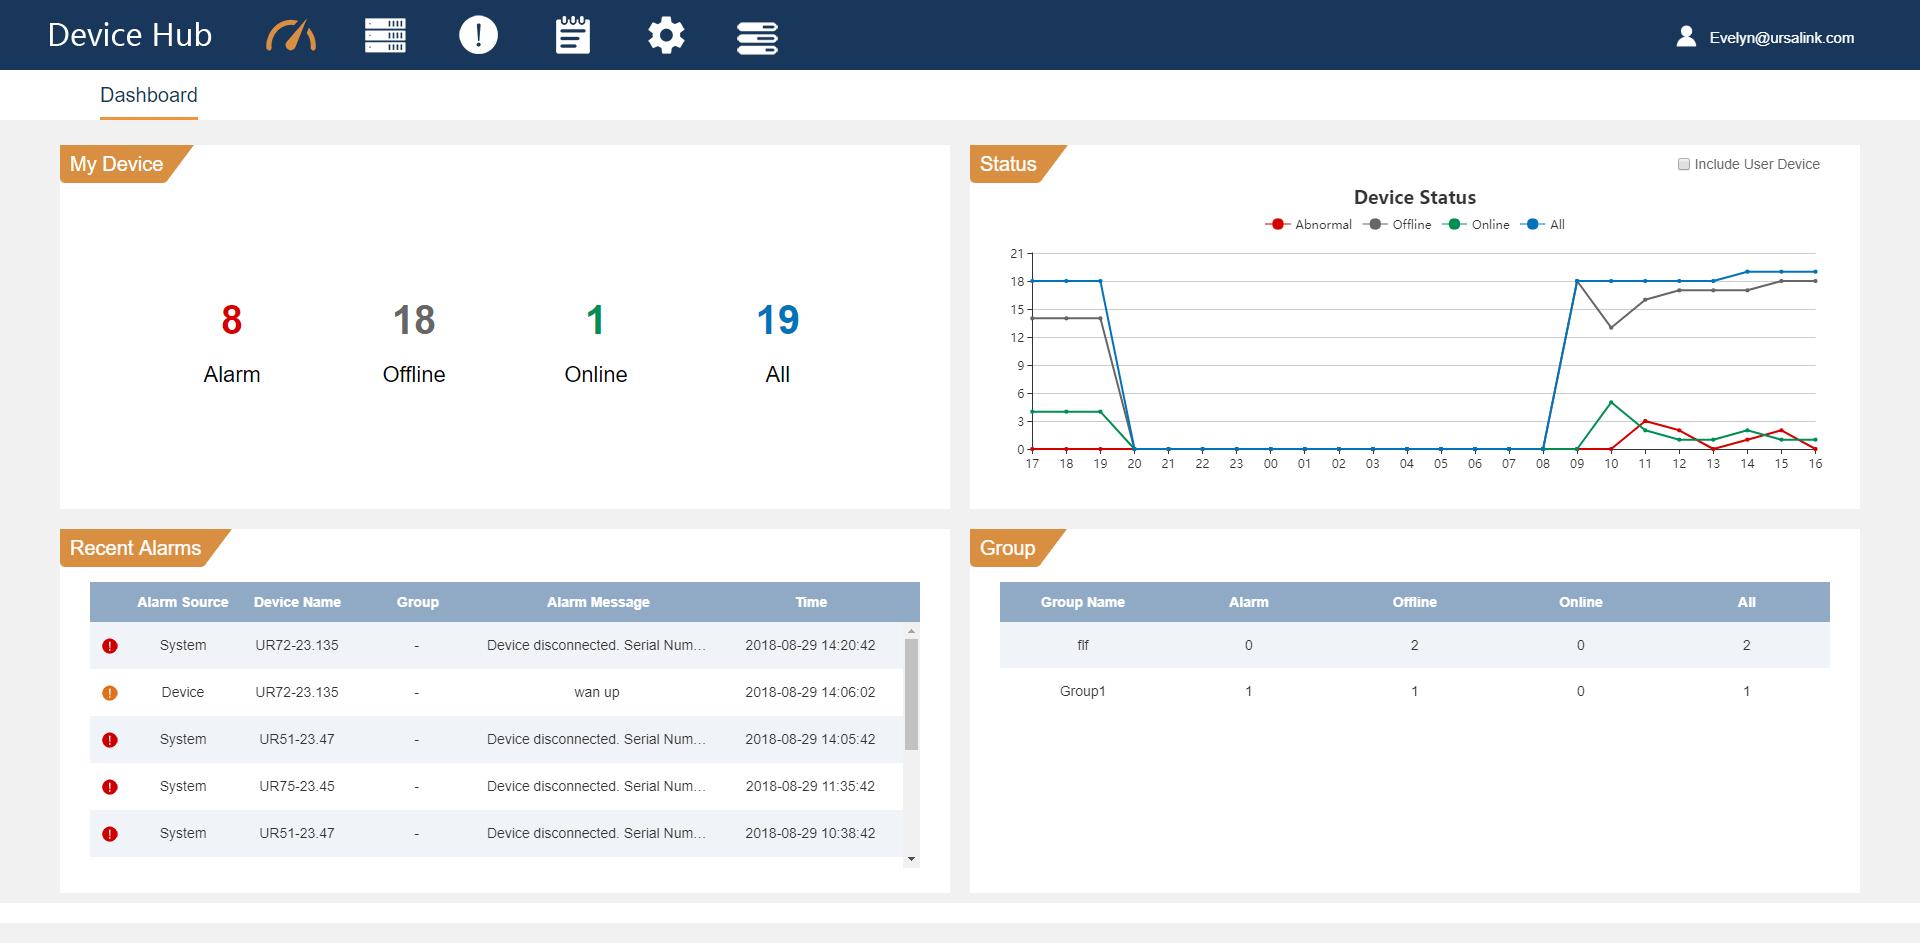 Ursalink_devicehub_dashboard2